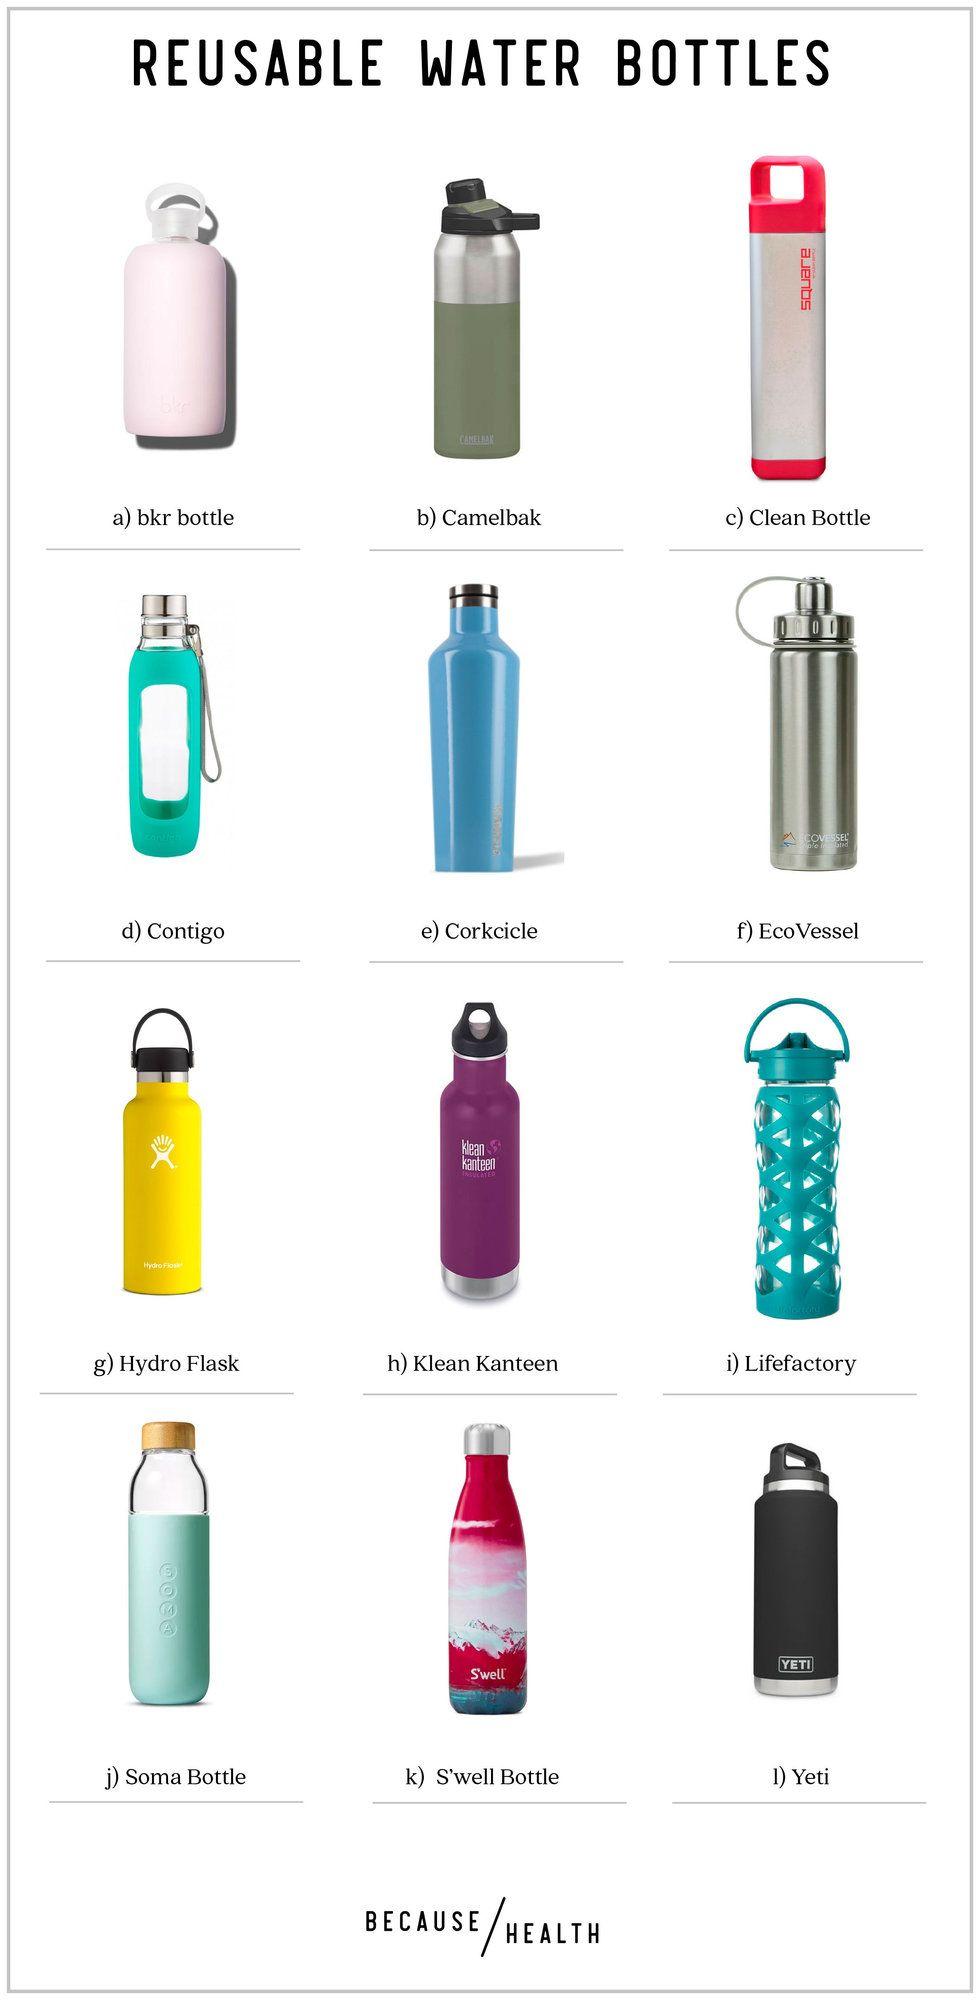 Roundup of the Best 12 Reusable Water Bottles